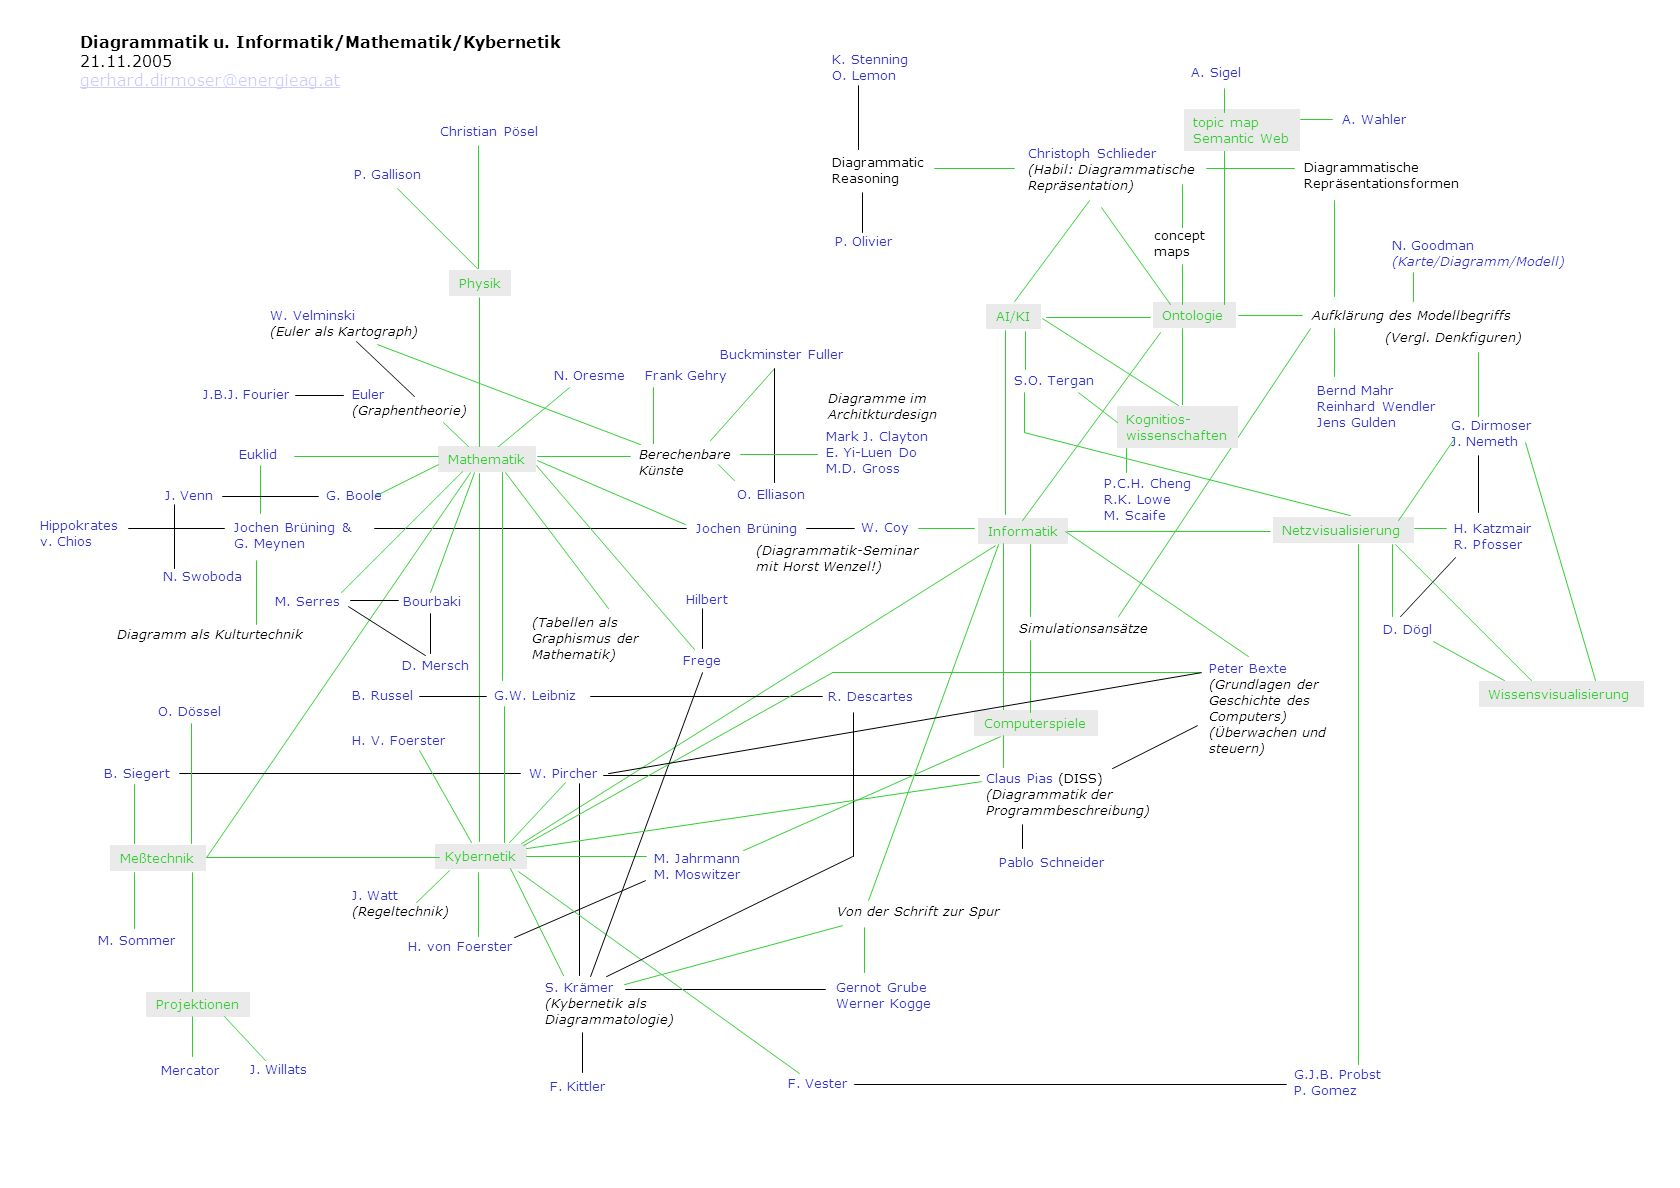 Diagrammatik u. Informatik/Mathematik/Kybernetik 21.11.2005